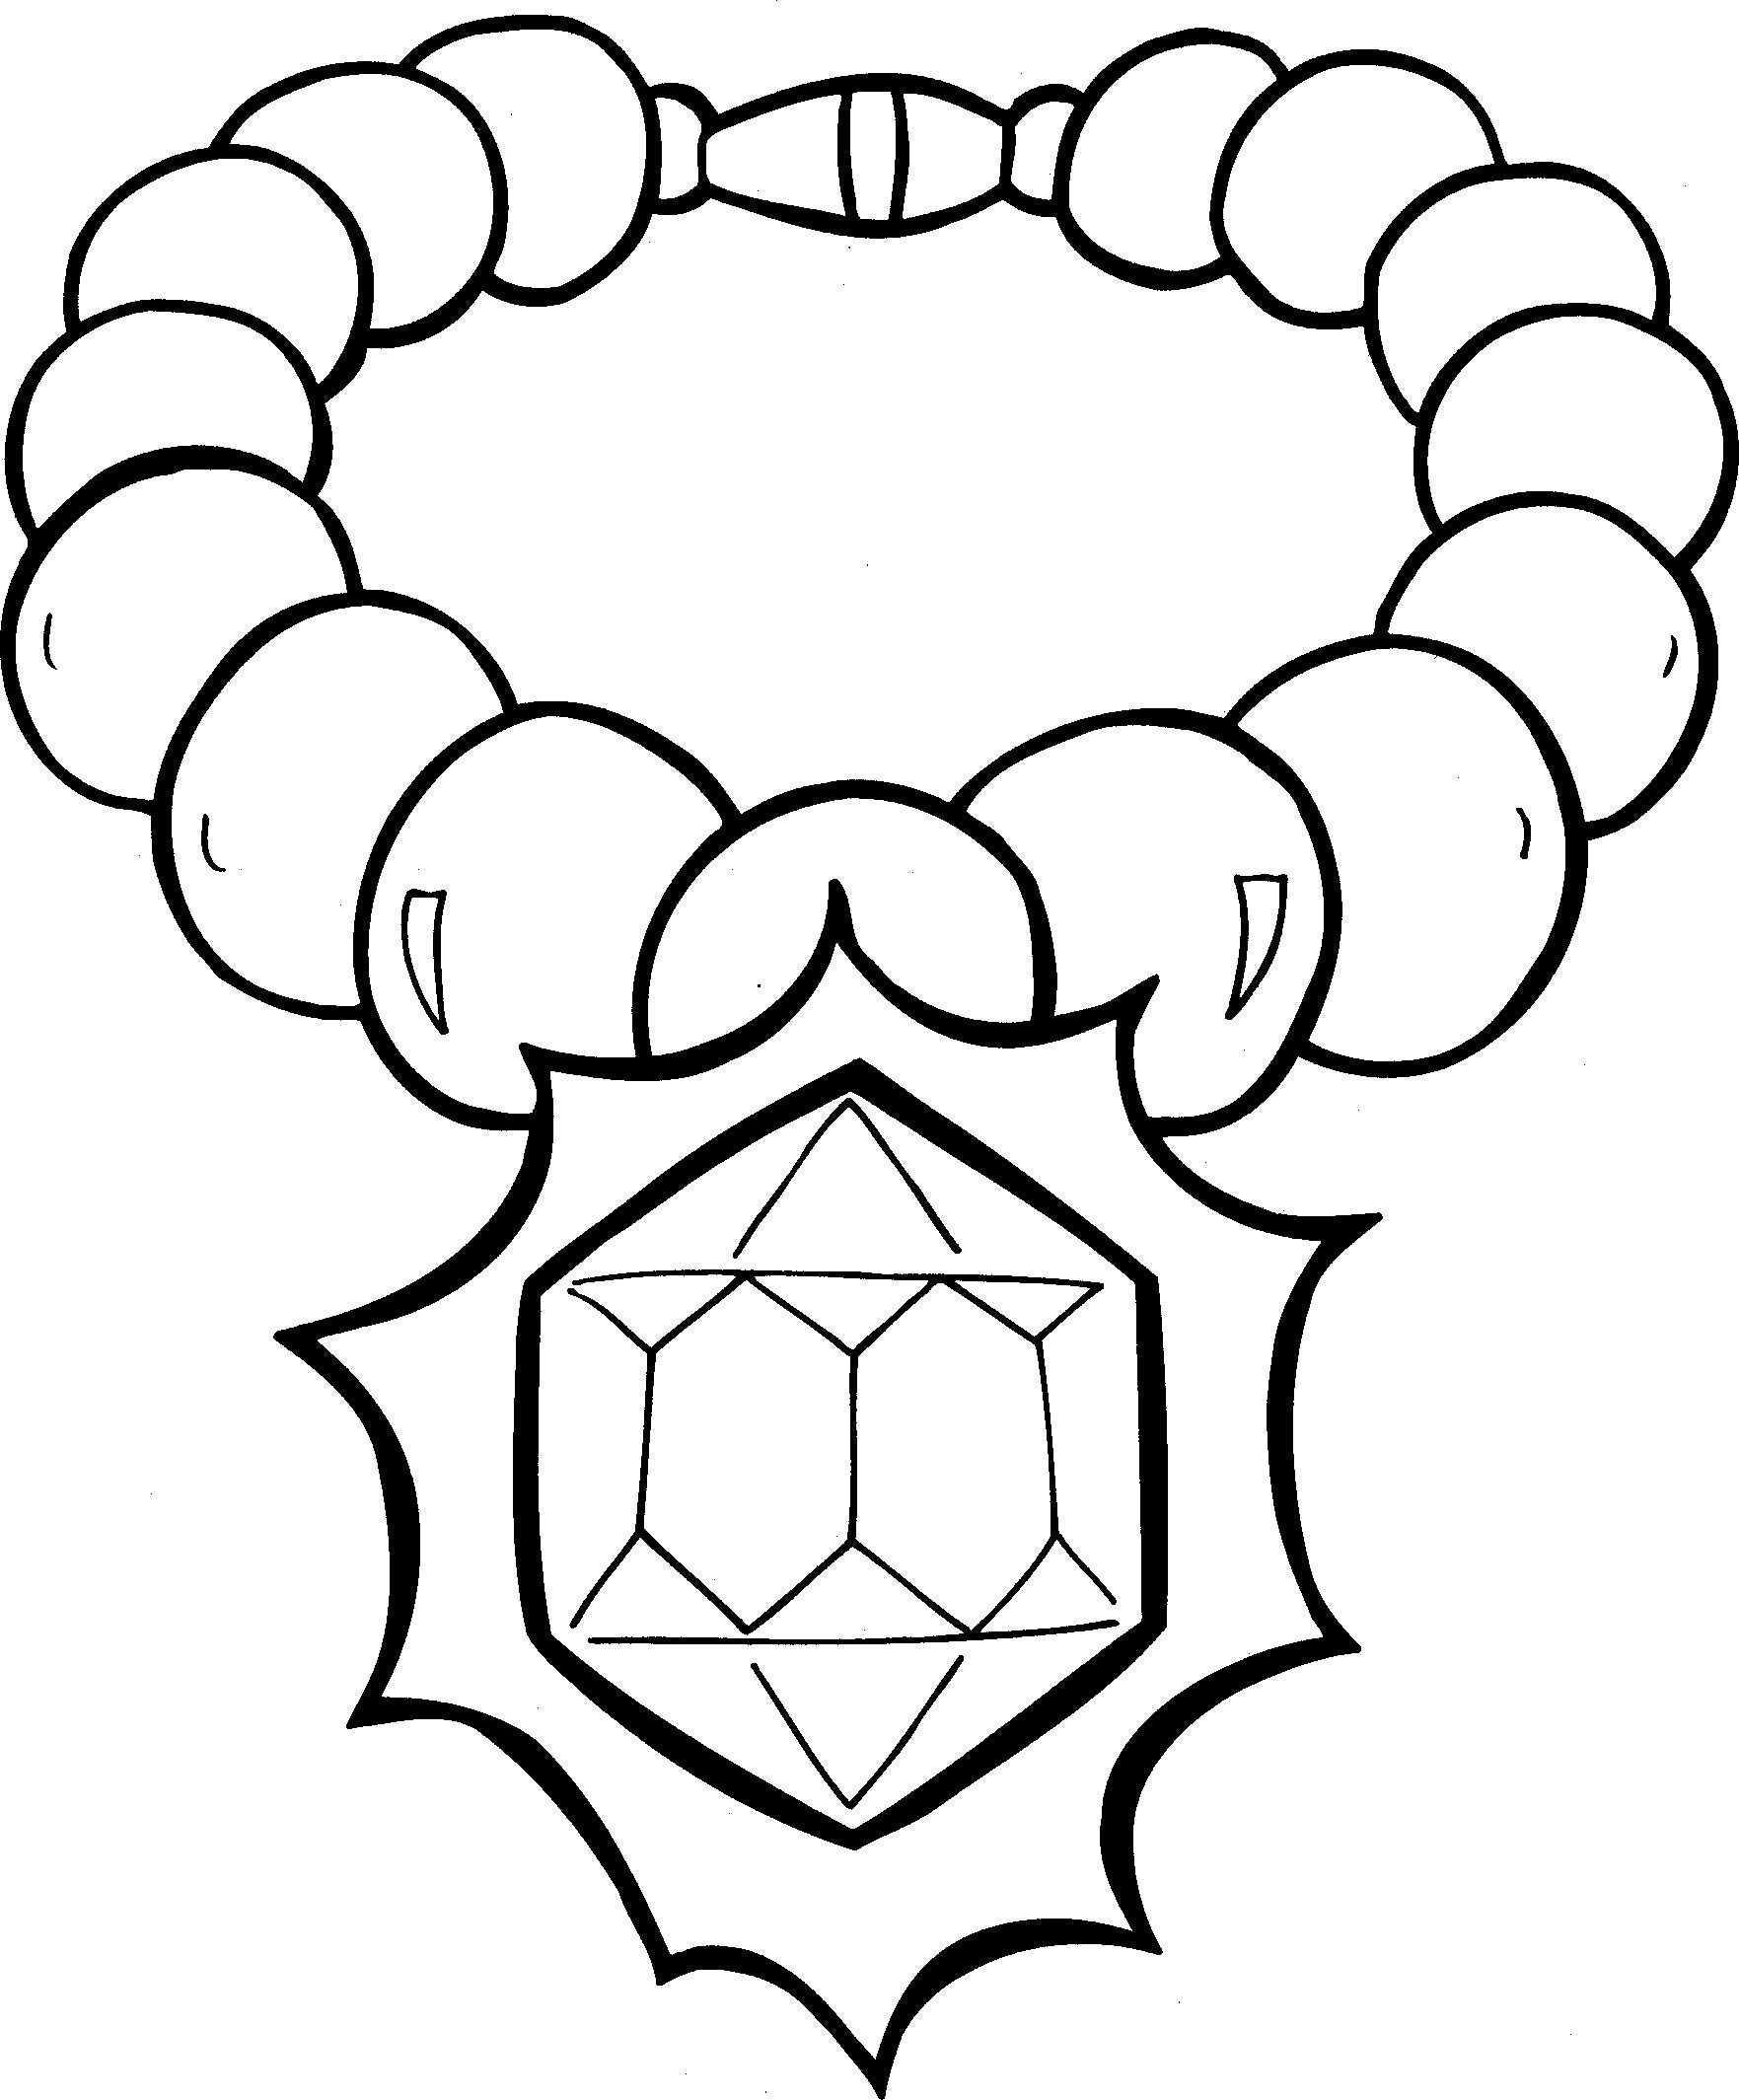 Ketting Prinses Symbols Art Ampersand